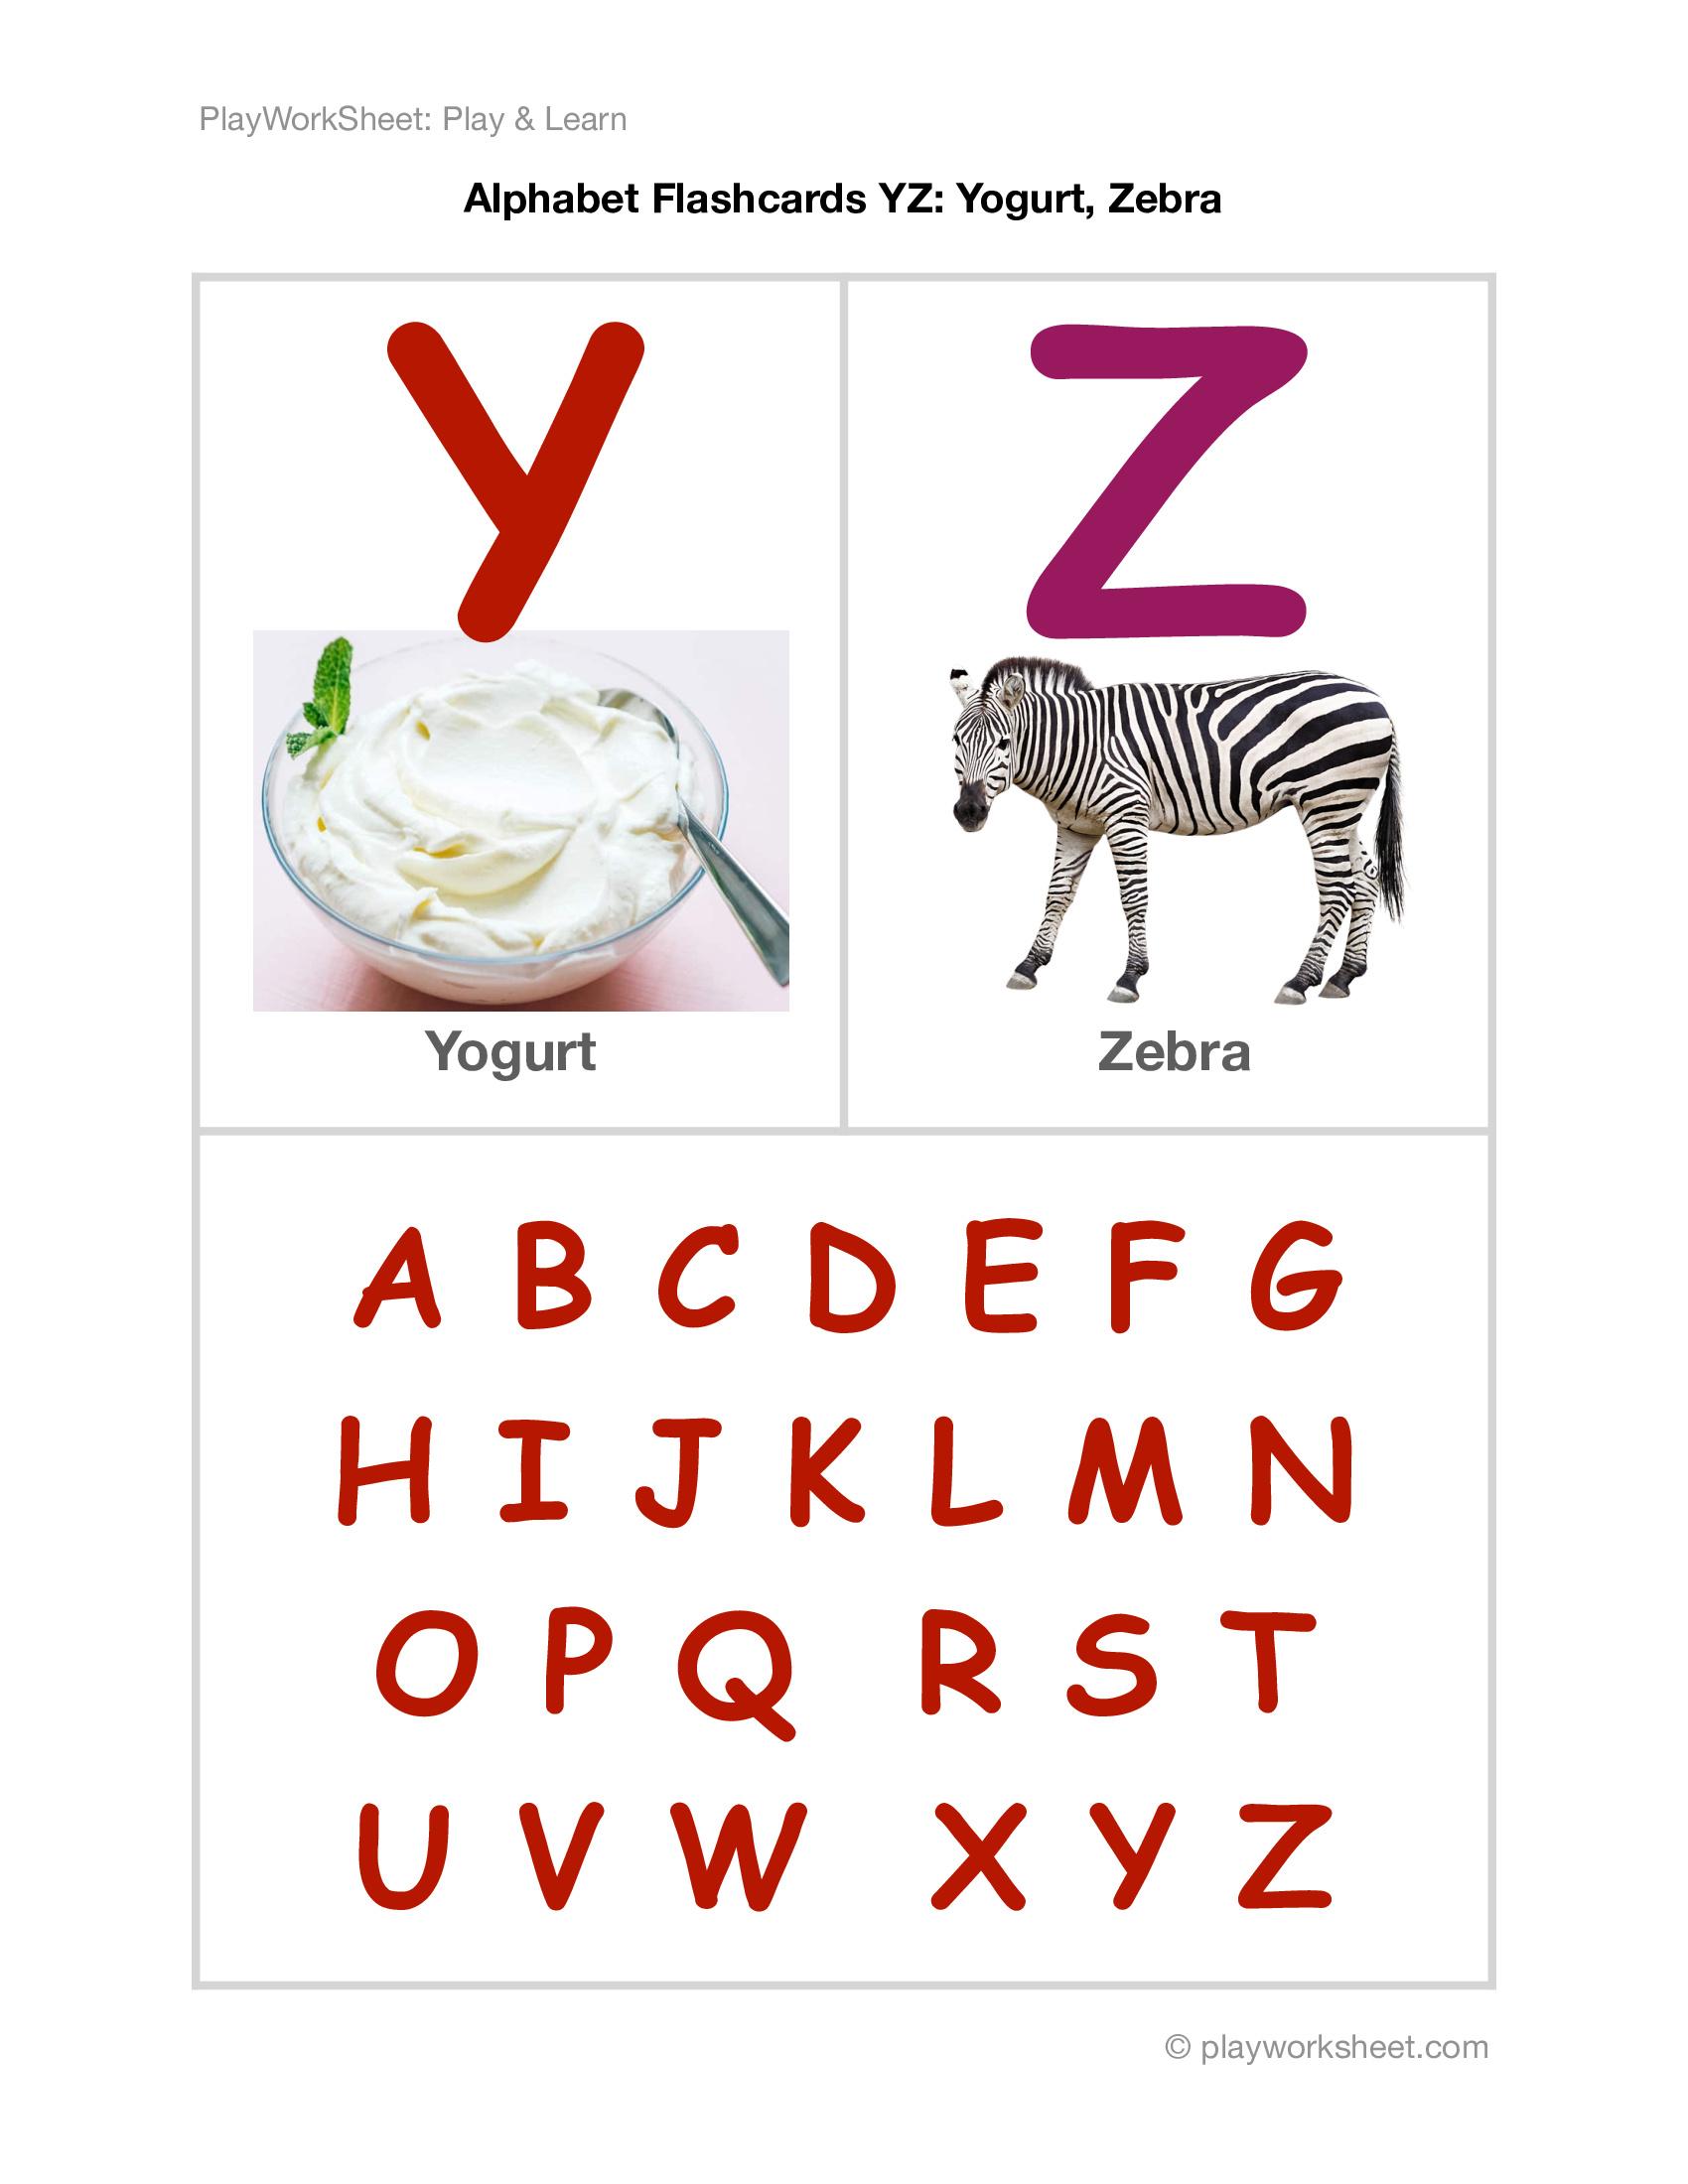 Alphabet Flashcards Yz